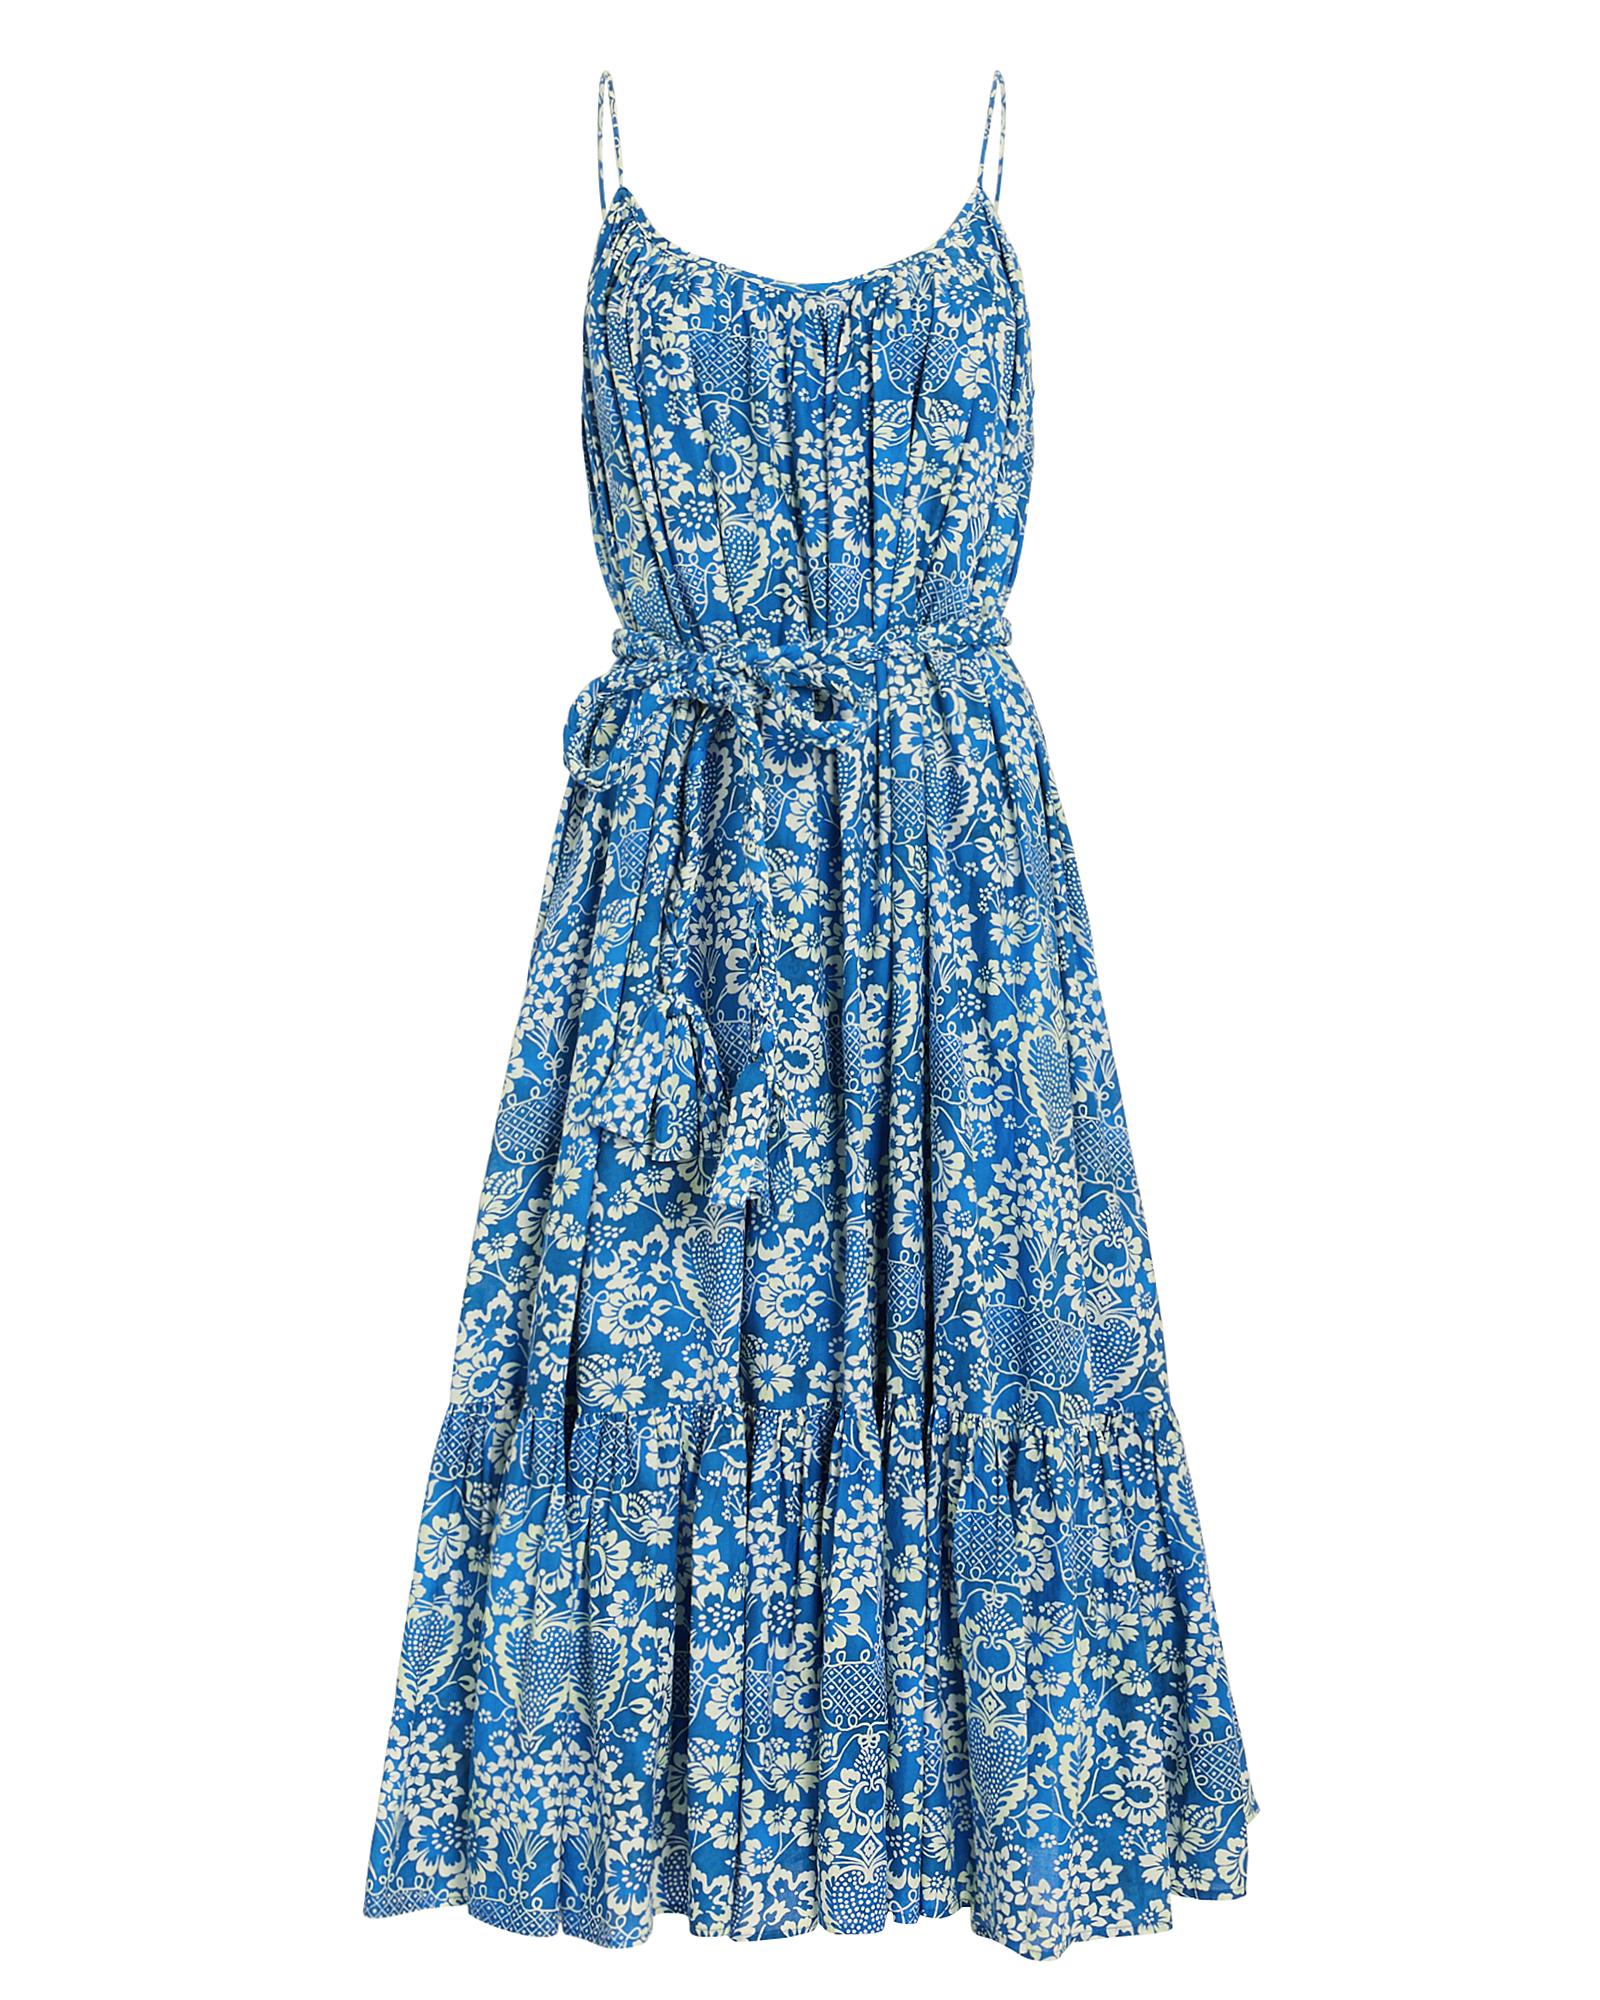 Lea Cotton Midi Dress by Rhode